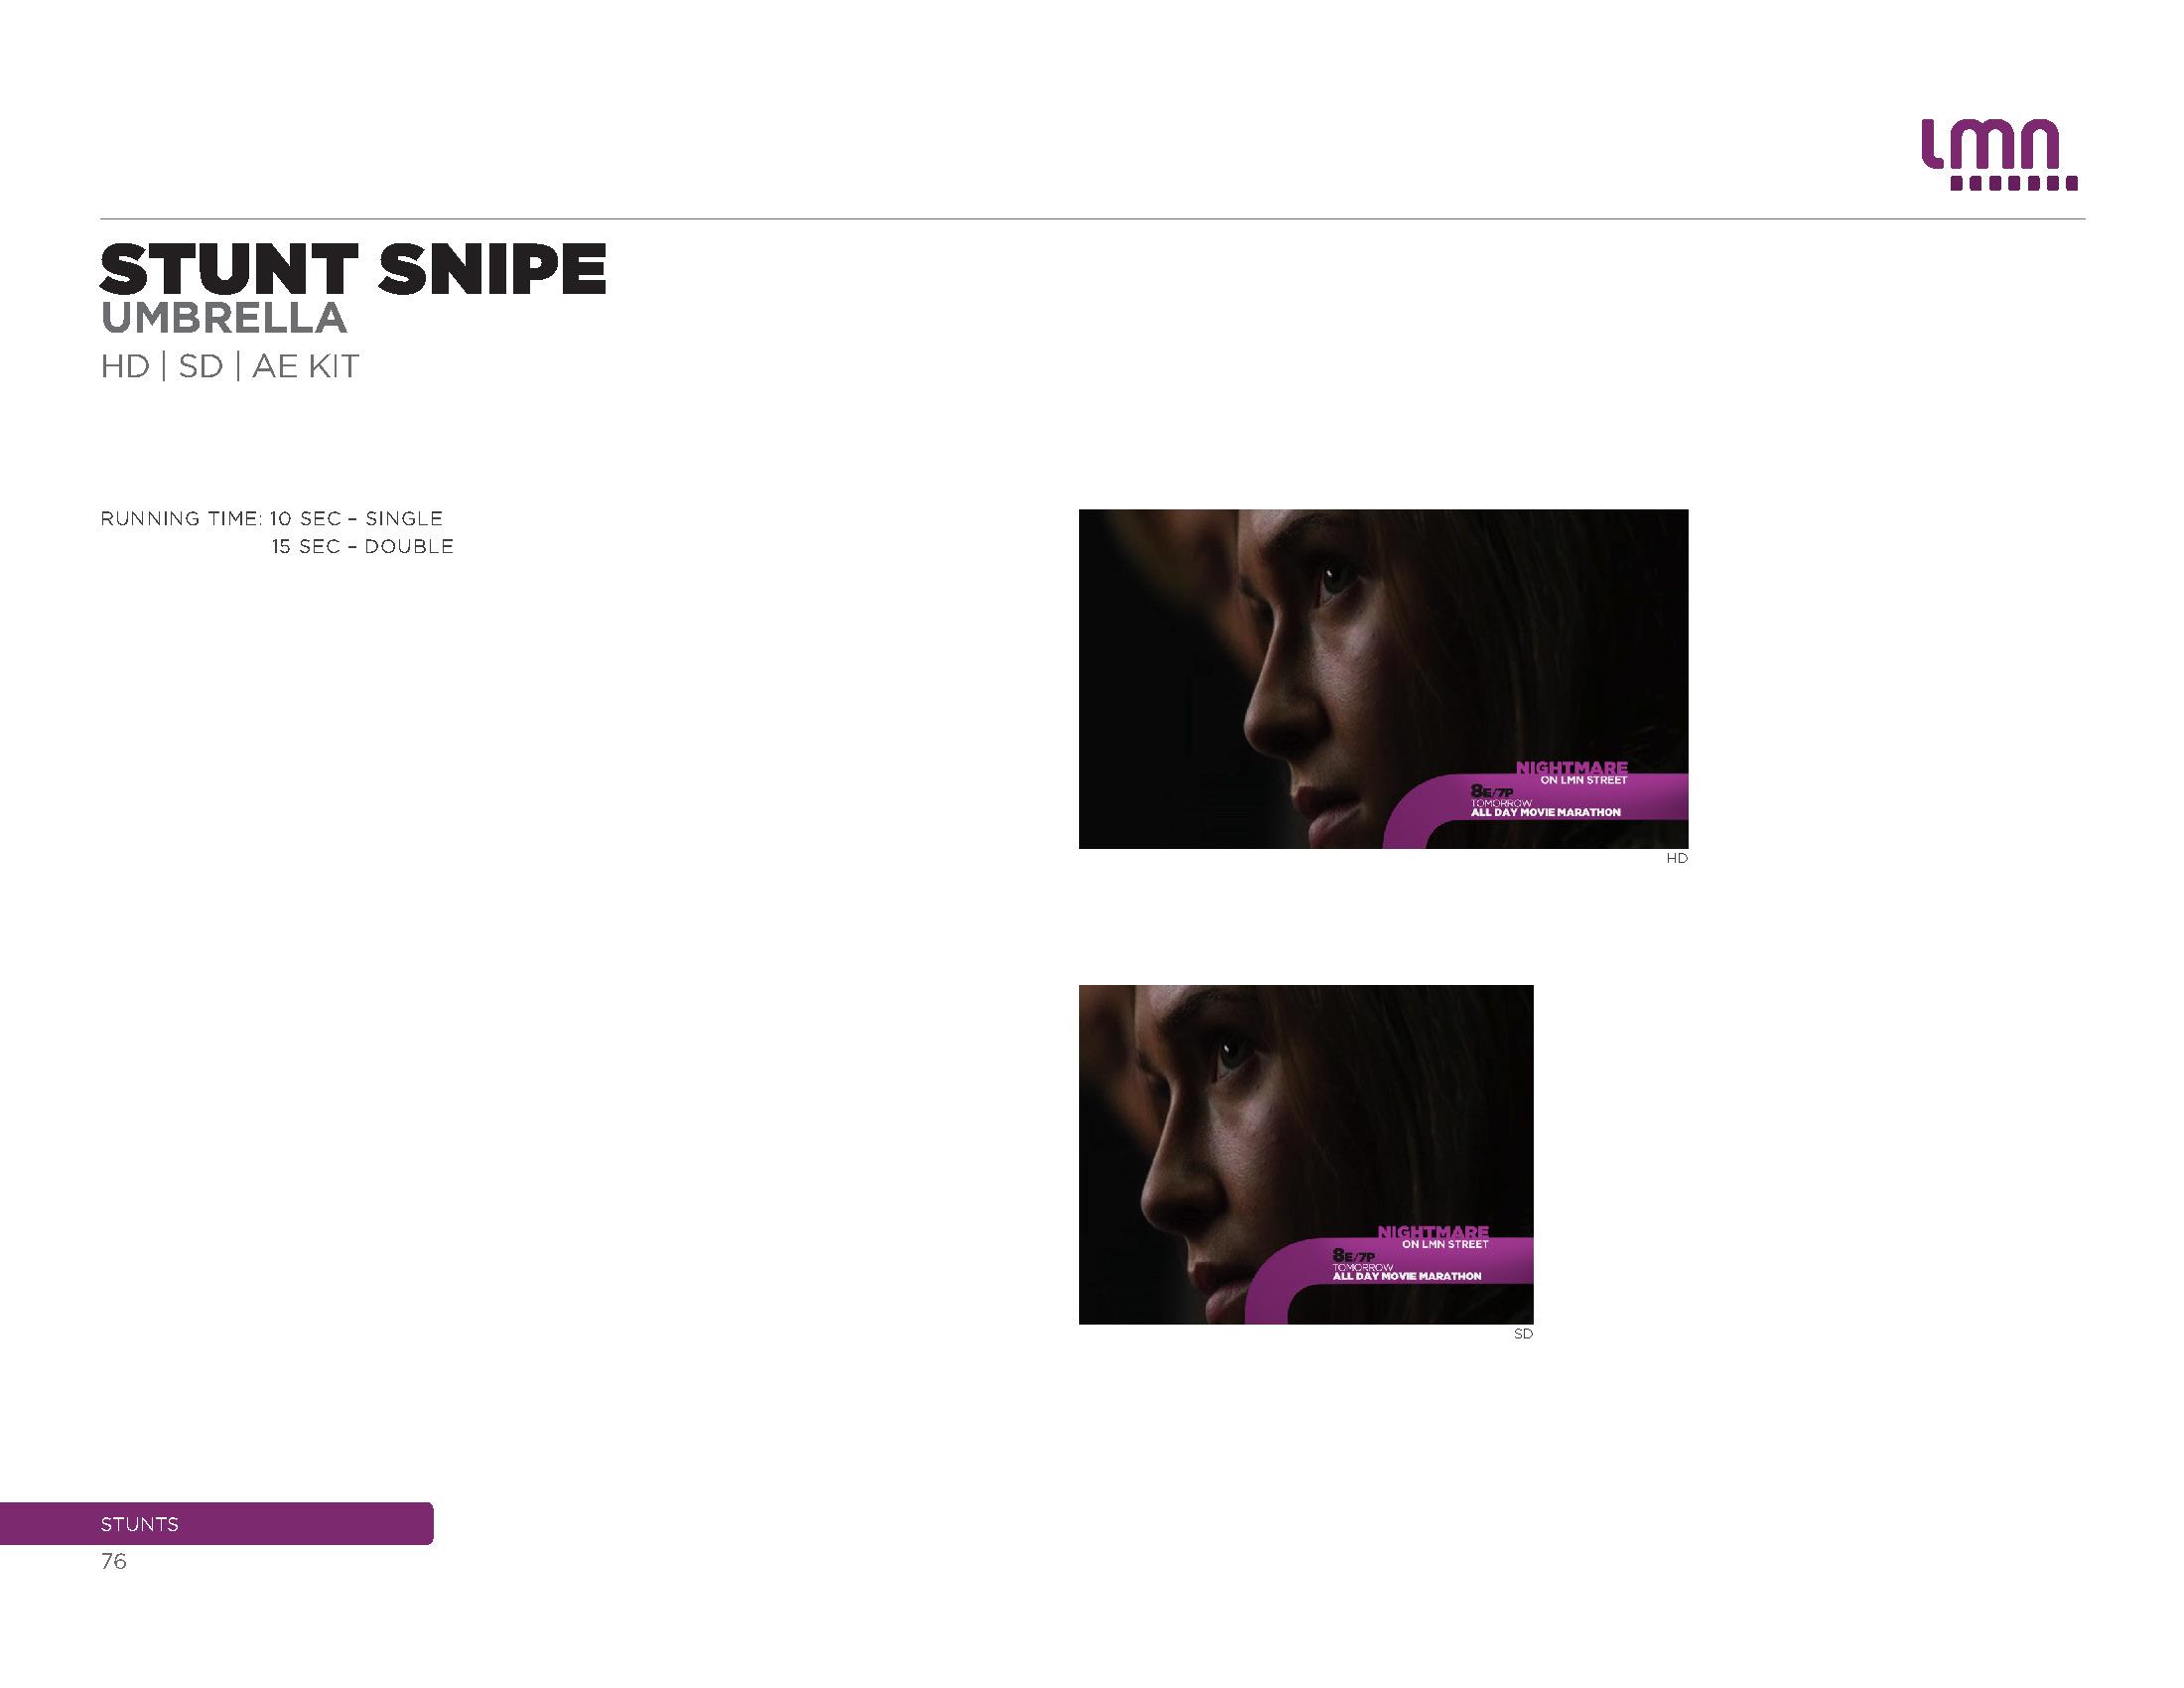 LMN_styleguide_092711_HQ_Page_76.jpg